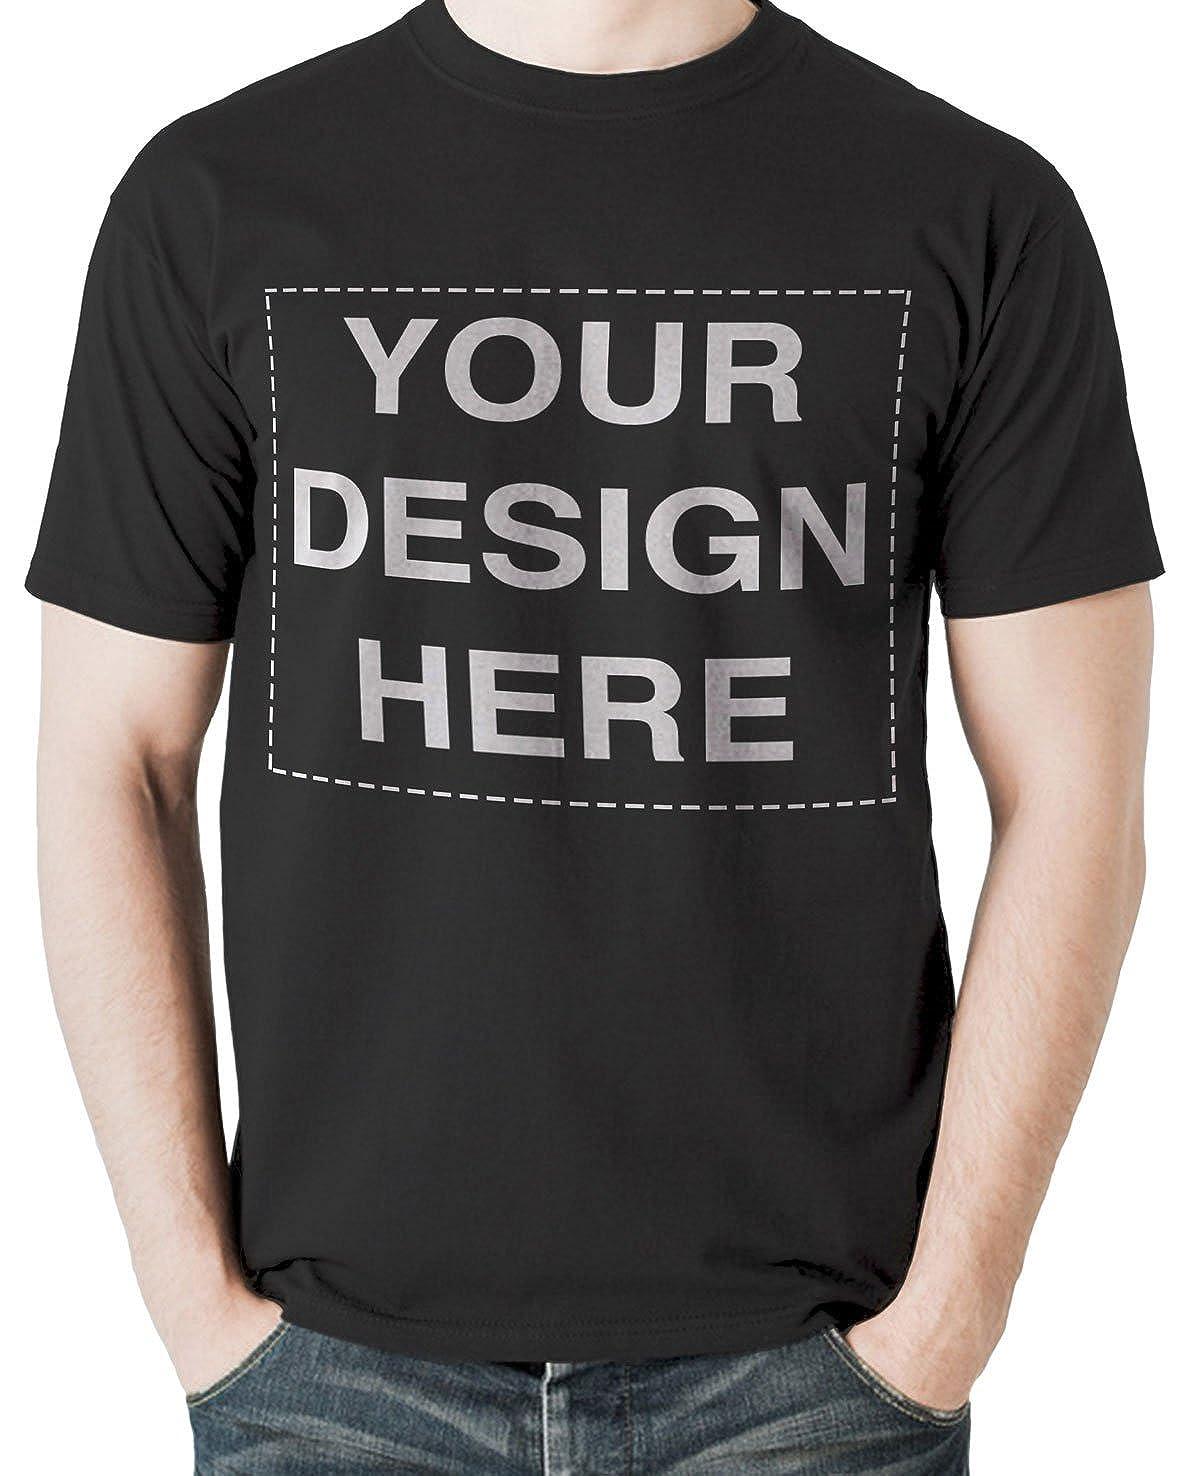 Amazon Custom T Shirt Design Your Own Text Image Adult Unisex